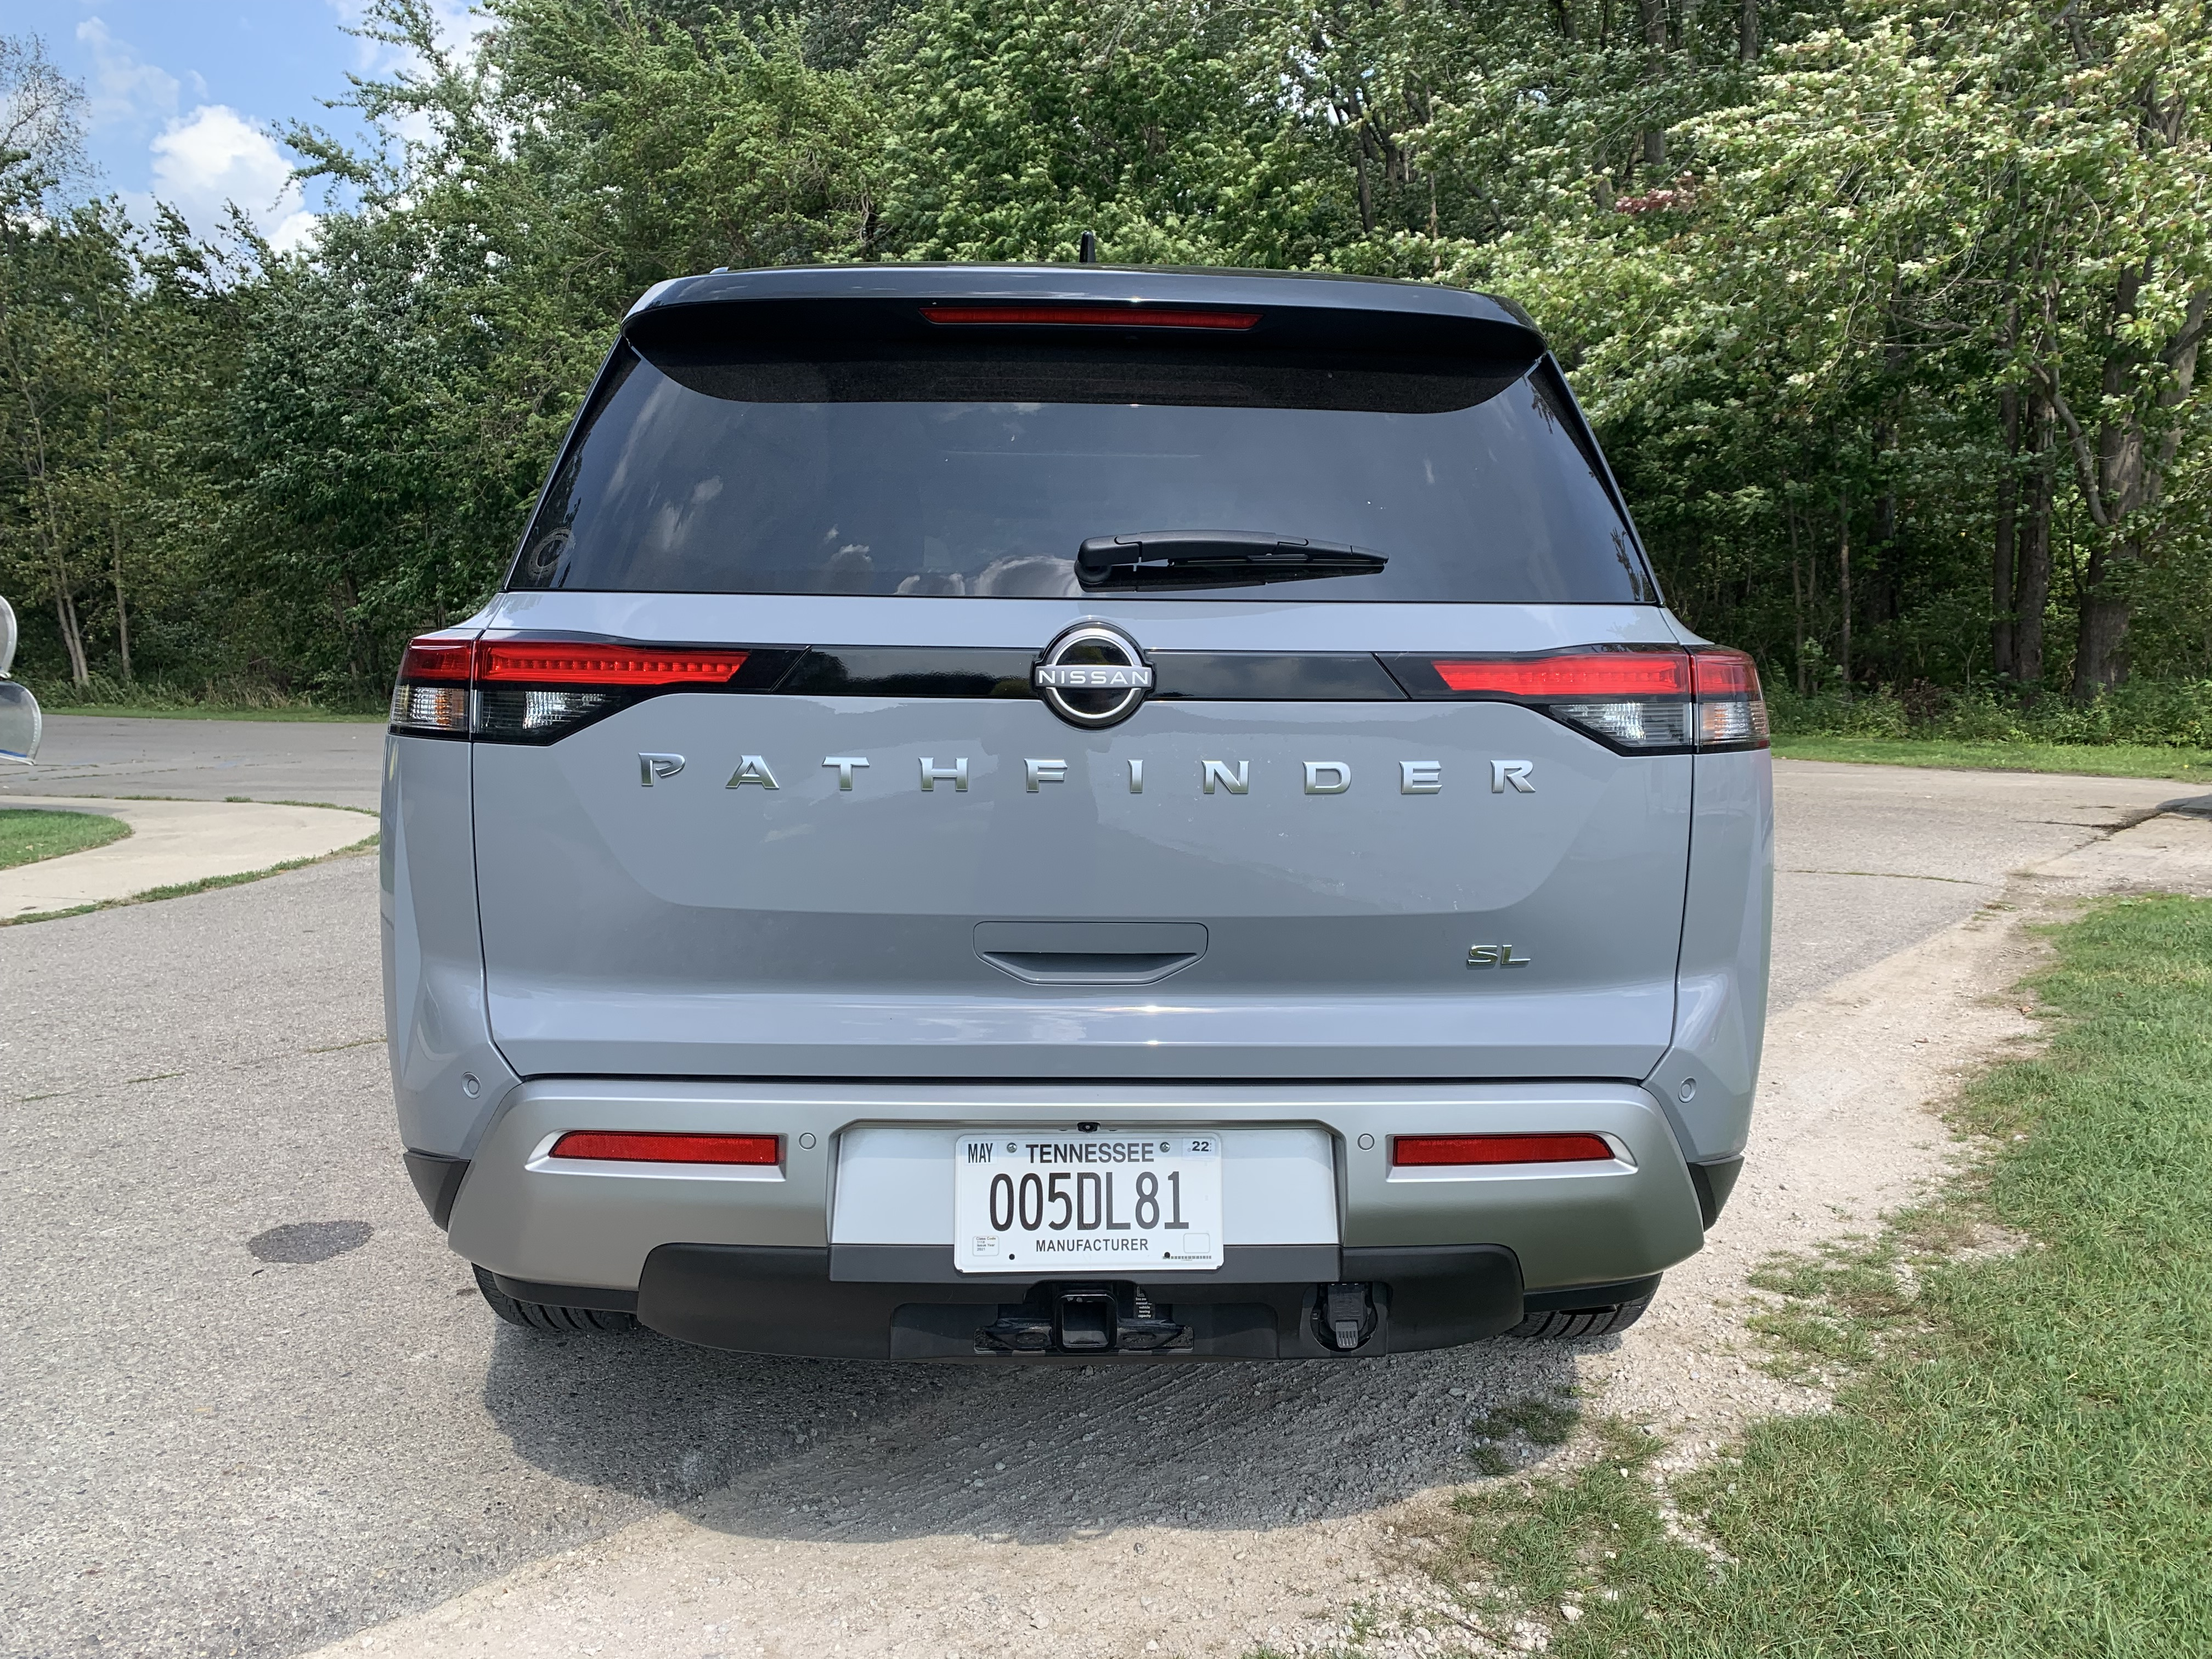 Pathfinder rear view